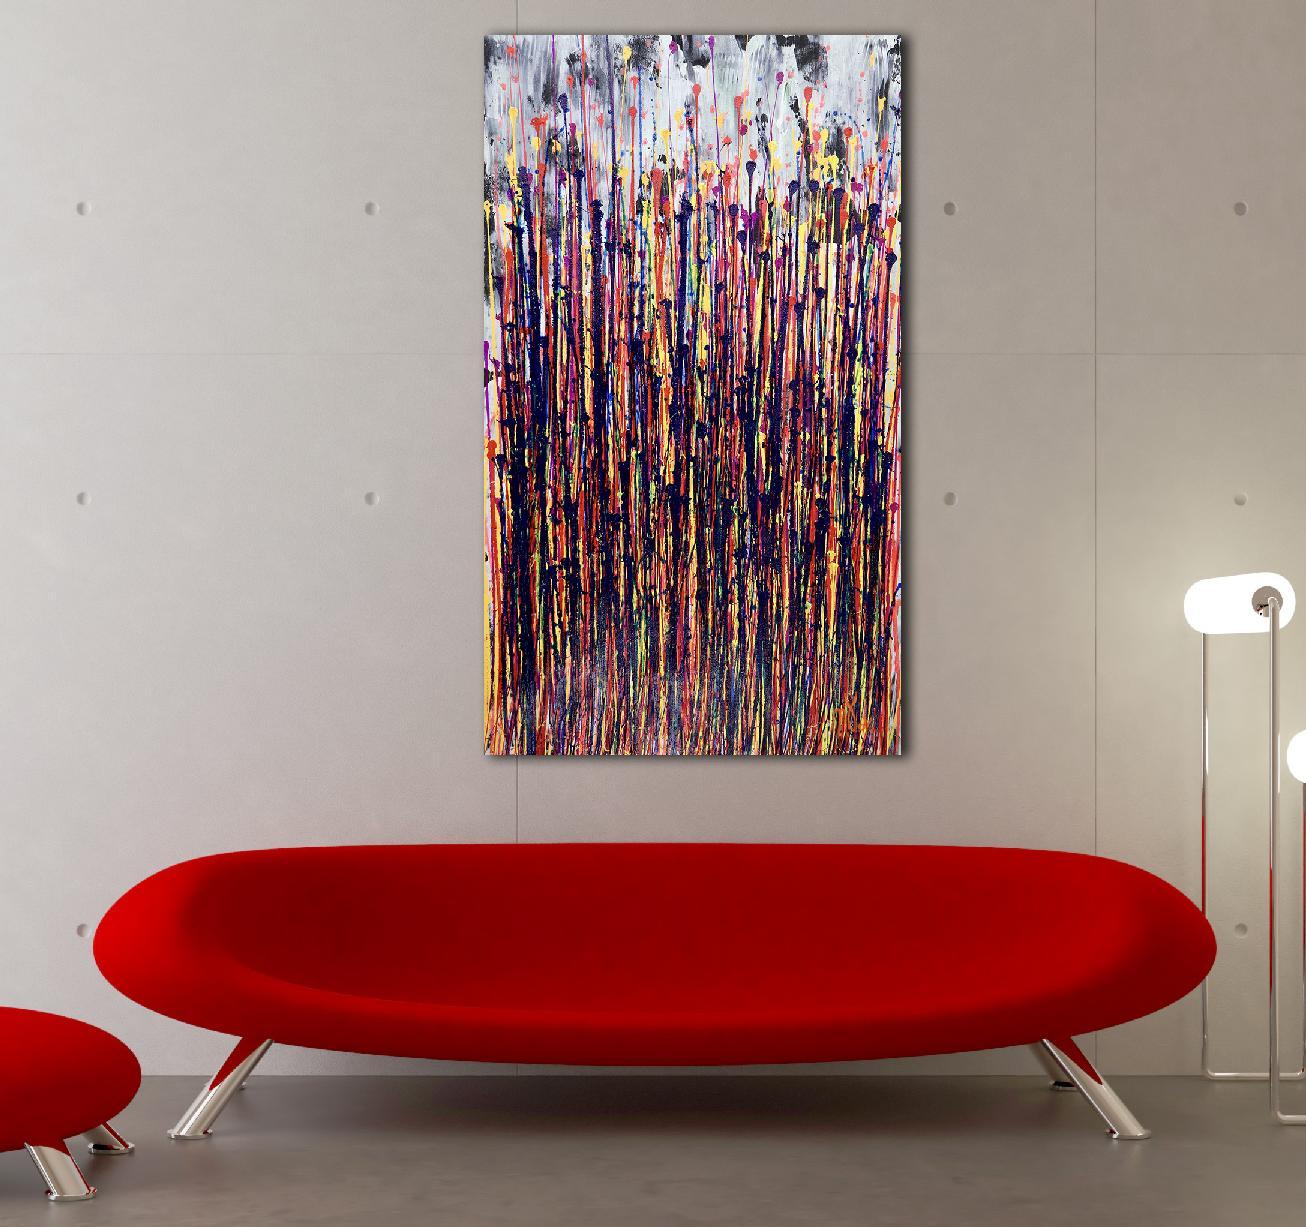 Illuminating Garden Spectra 2 (2020) Abstract painting by Nestor Toro